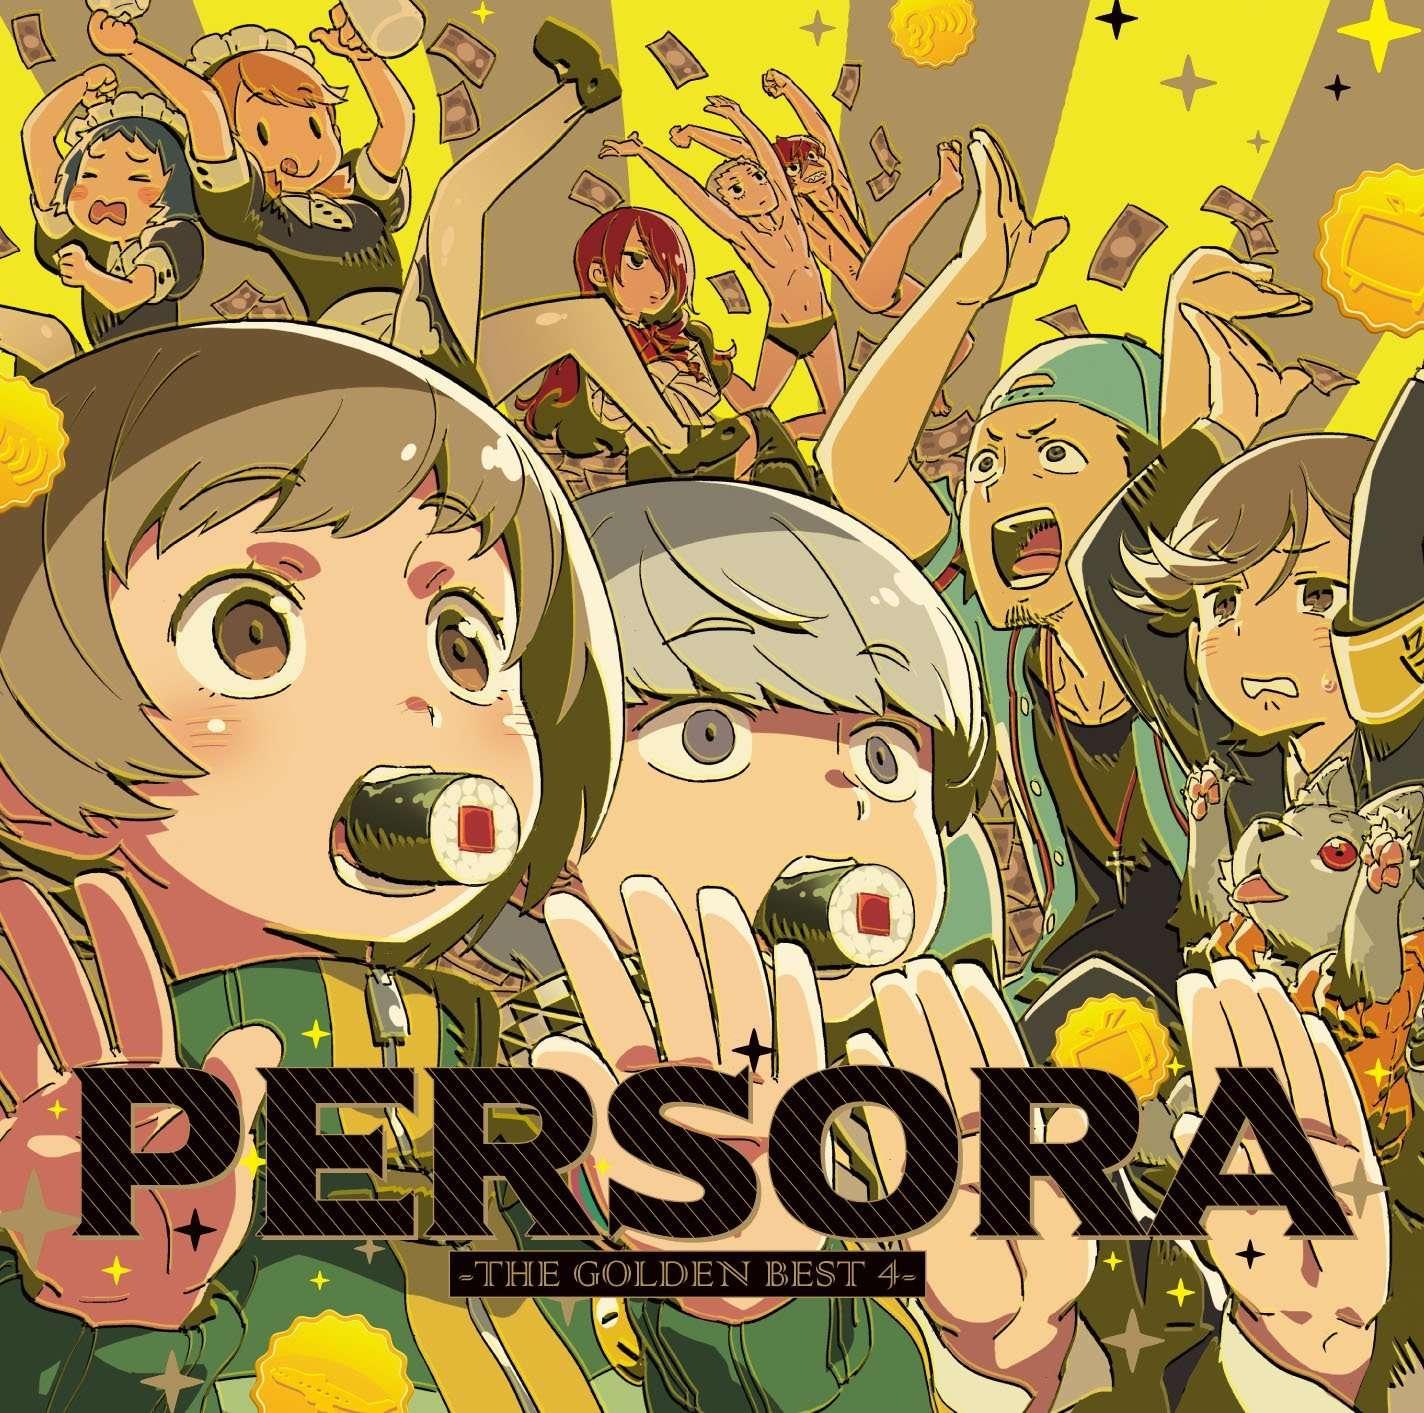 Persora The Golden Best 4 Concept Album Cover Art Details Persona Central